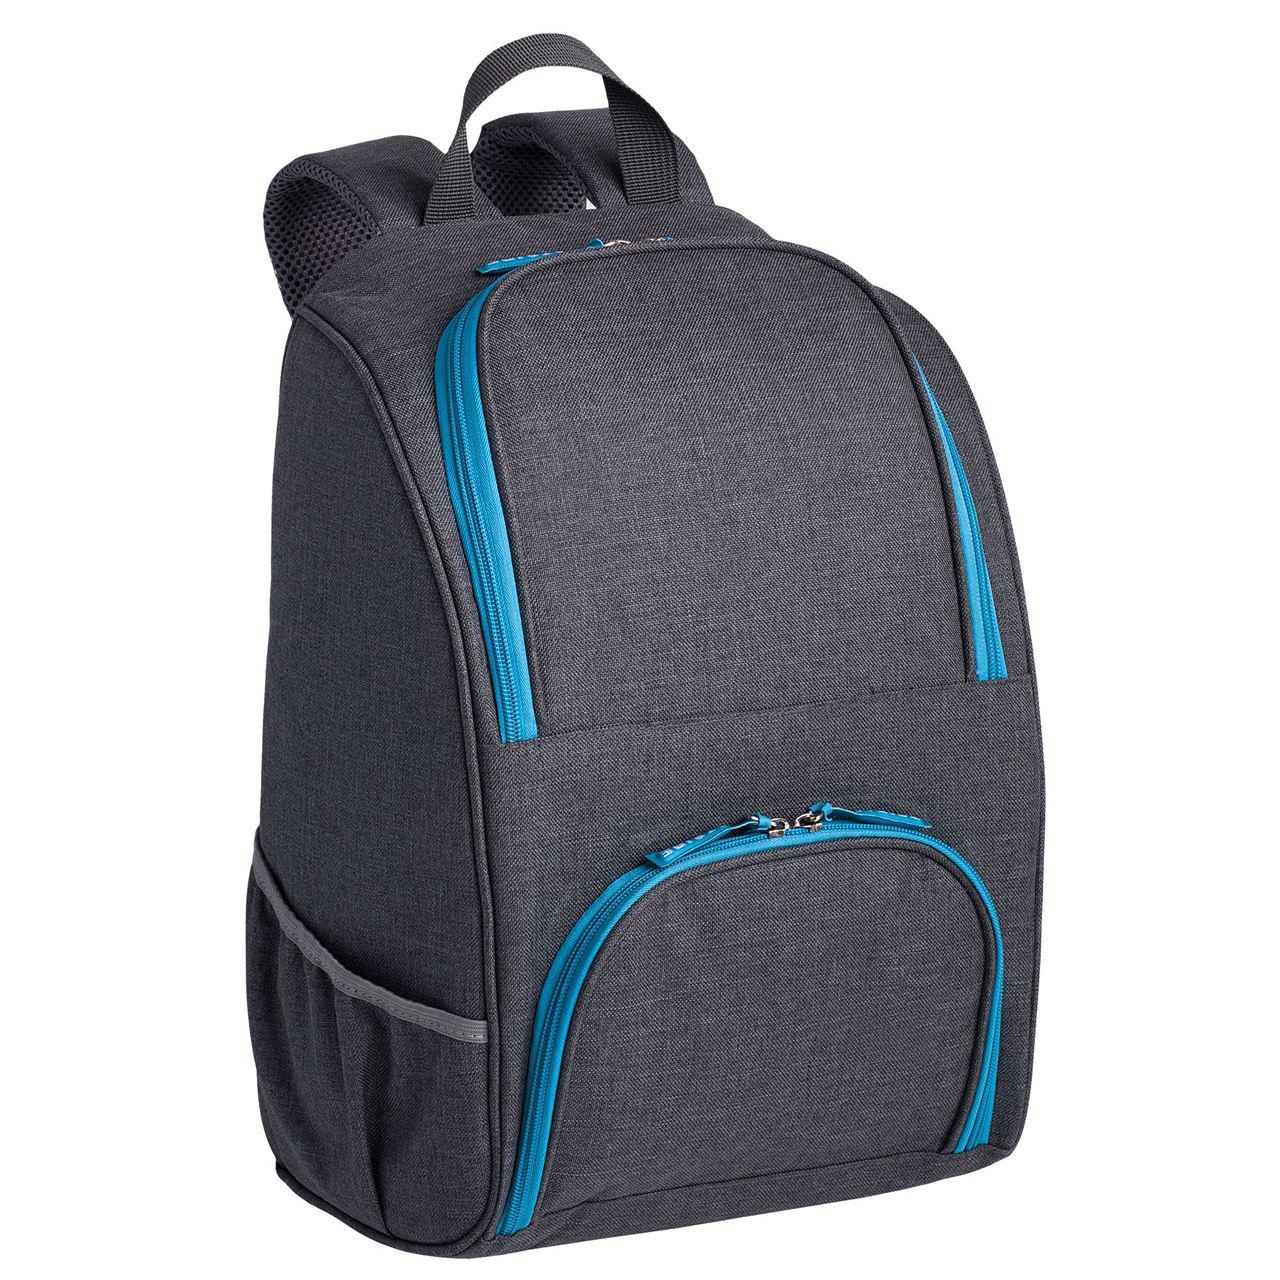 "Изотермический рюкзак ""Liten Fest"", серый с синим от 1 824 руб"